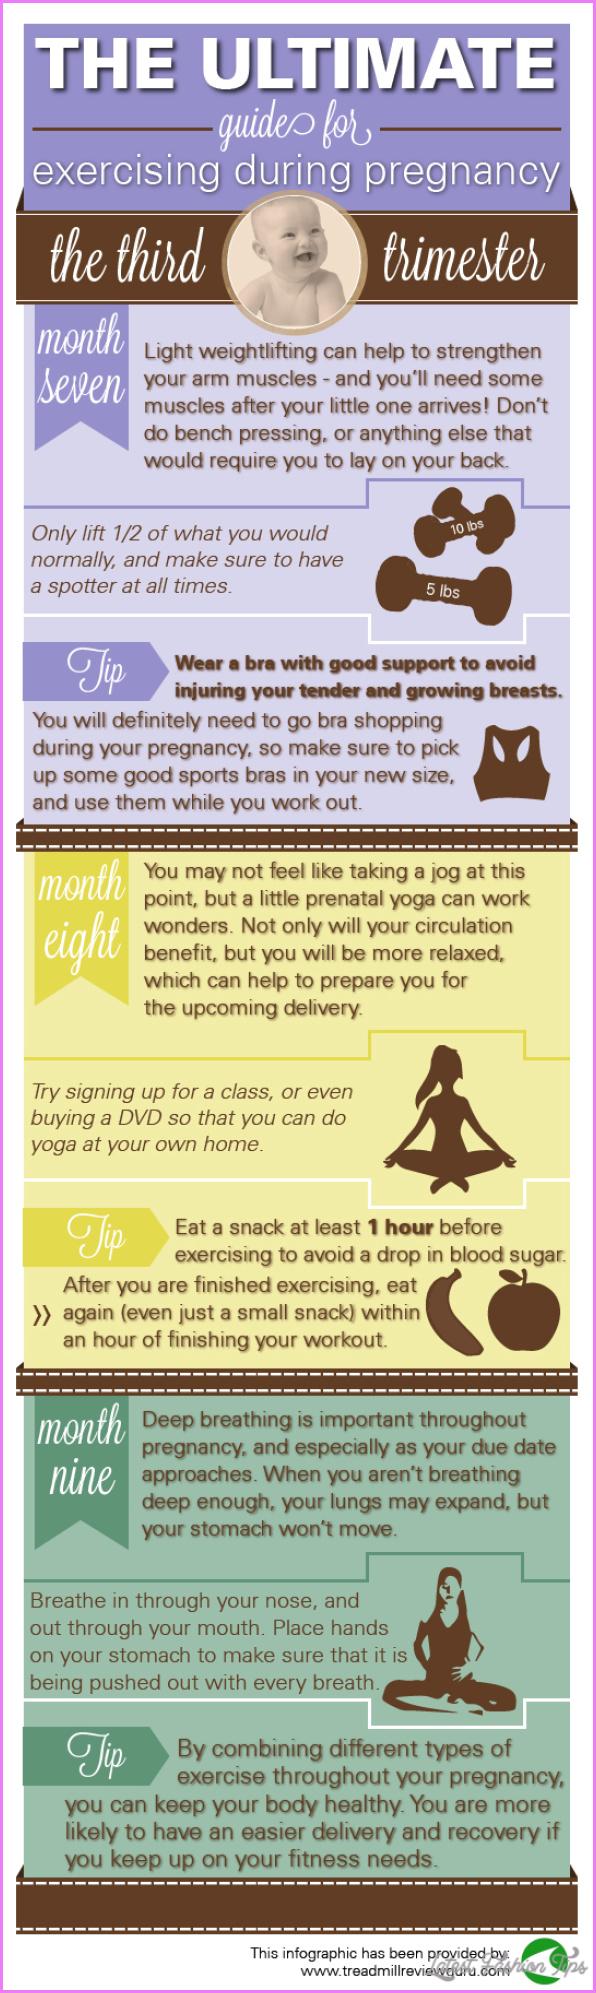 Exercise During Pregnancy Third Trimester_17.jpg